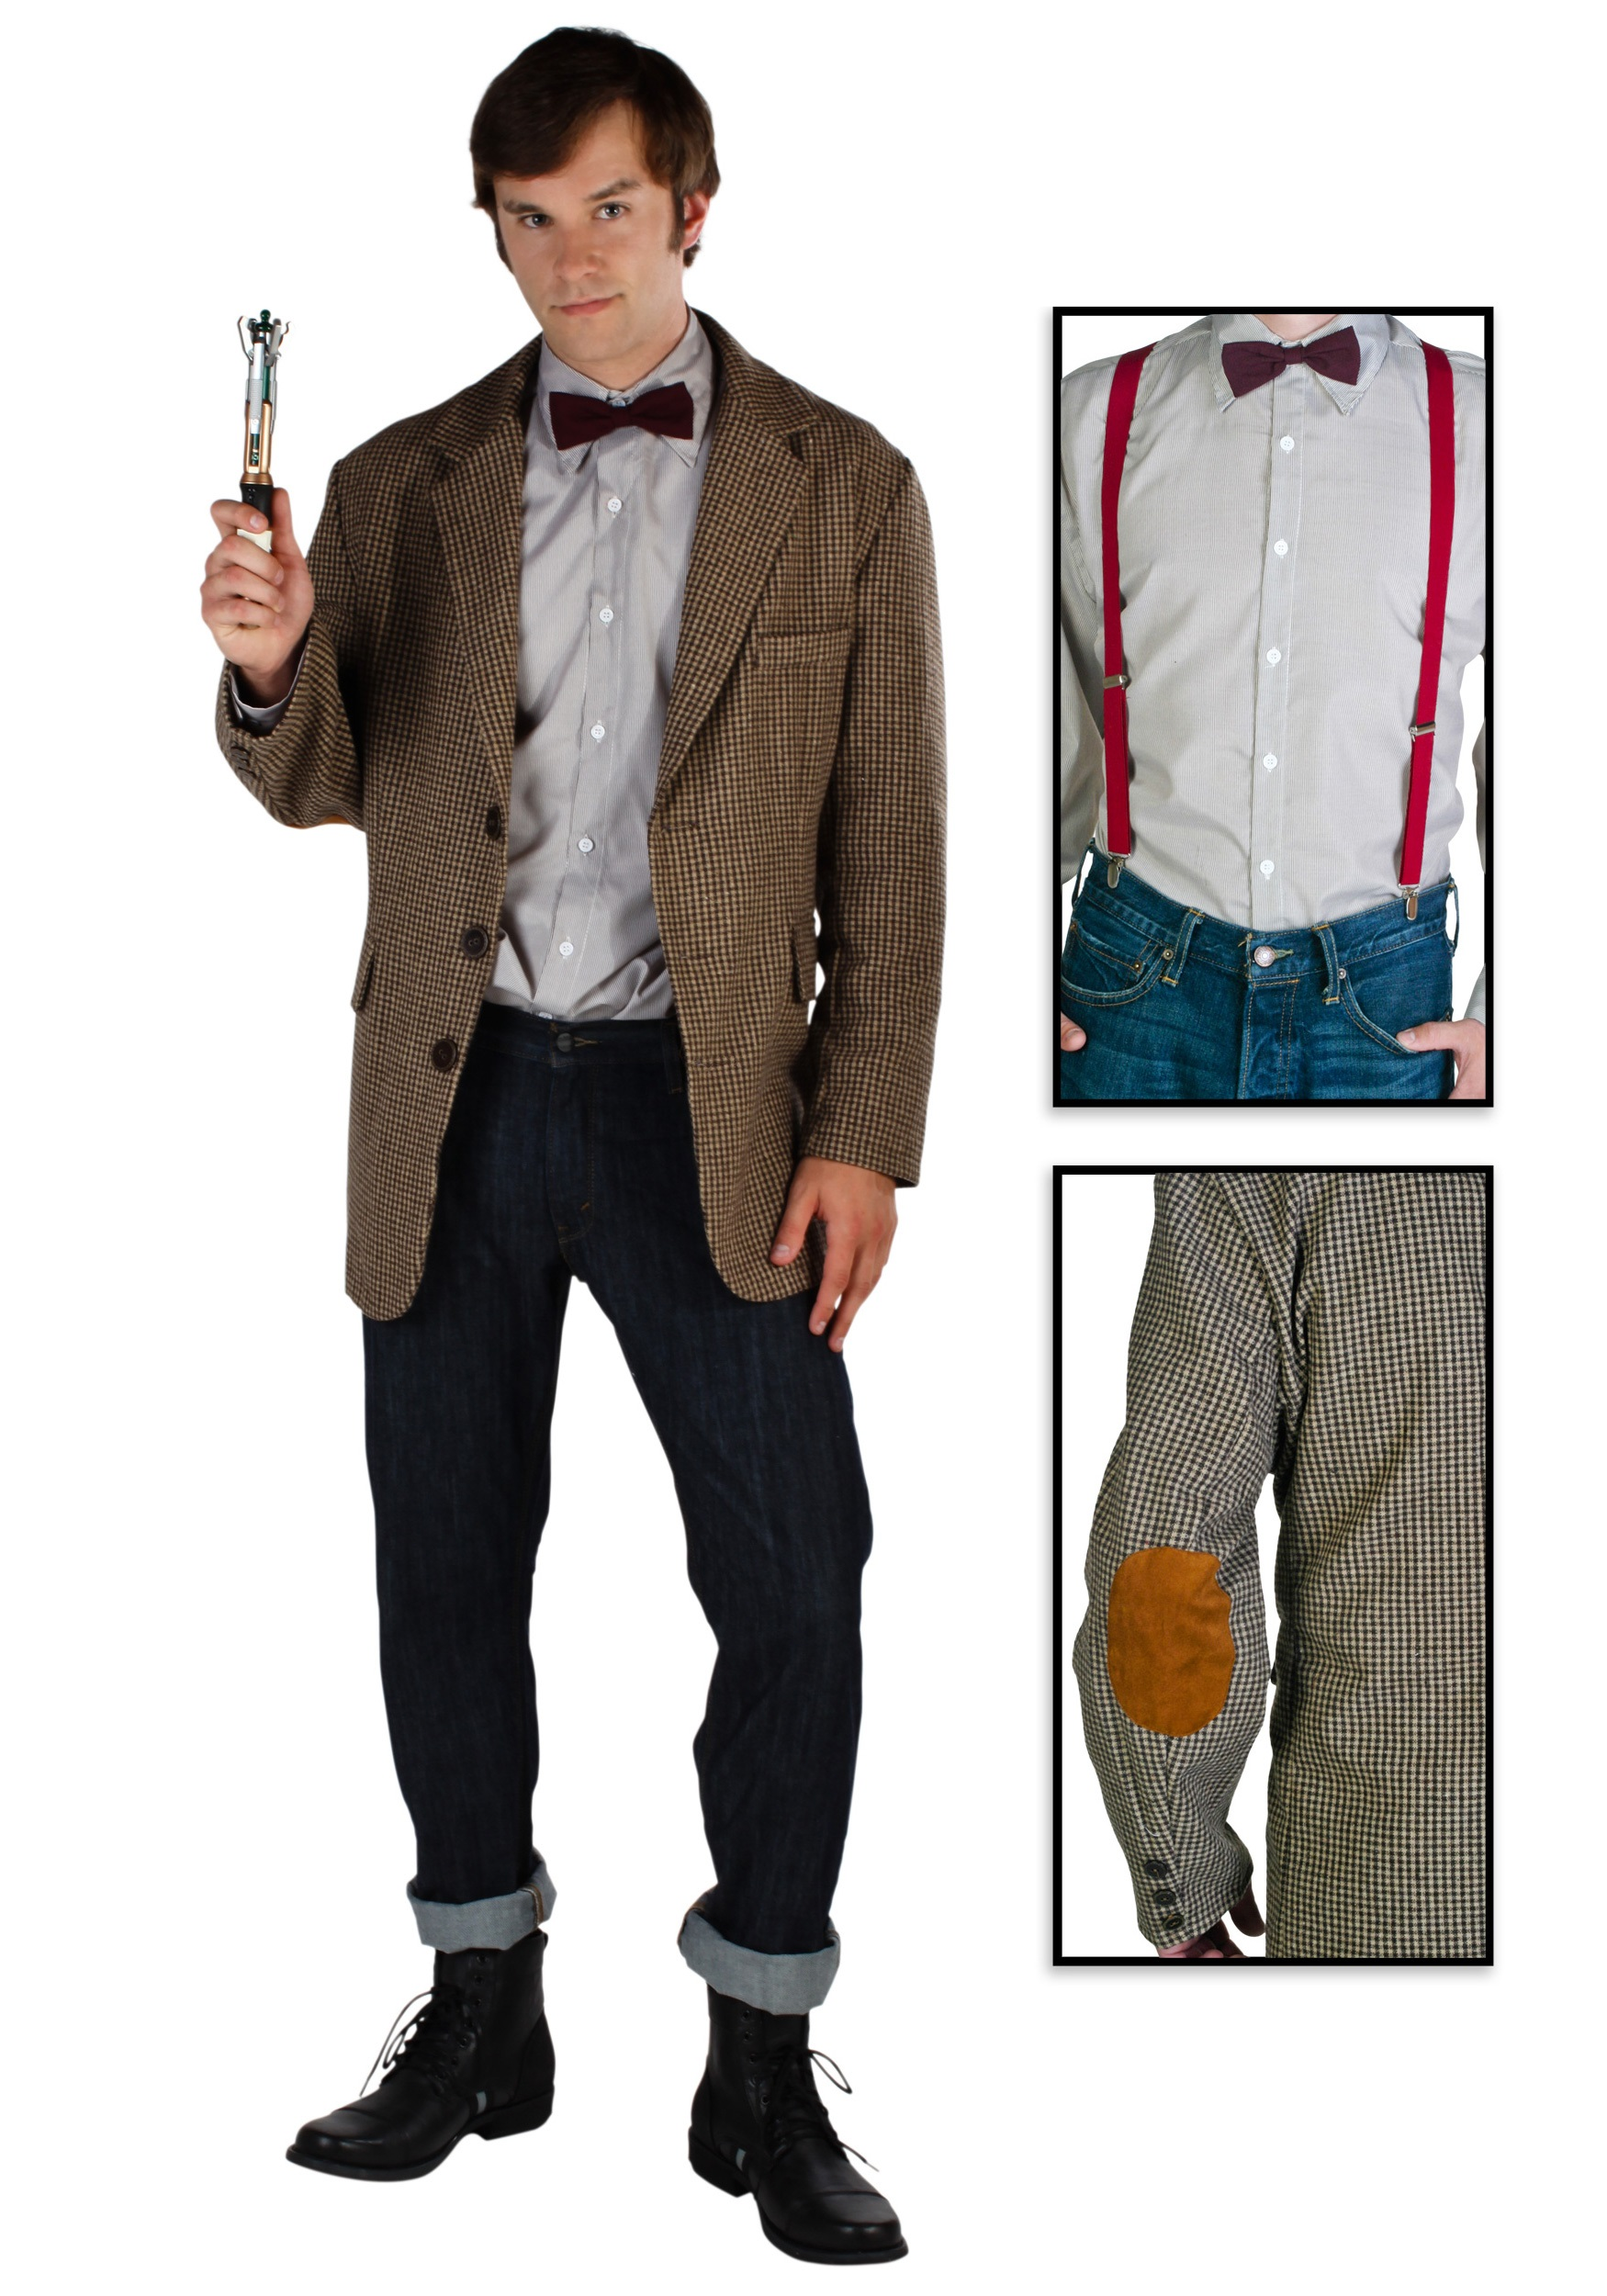 Plus Size Doctor Professor Costume  sc 1 st  Halloween Costumes & Plus Size Doctor Professor Costume - Halloween Costumes